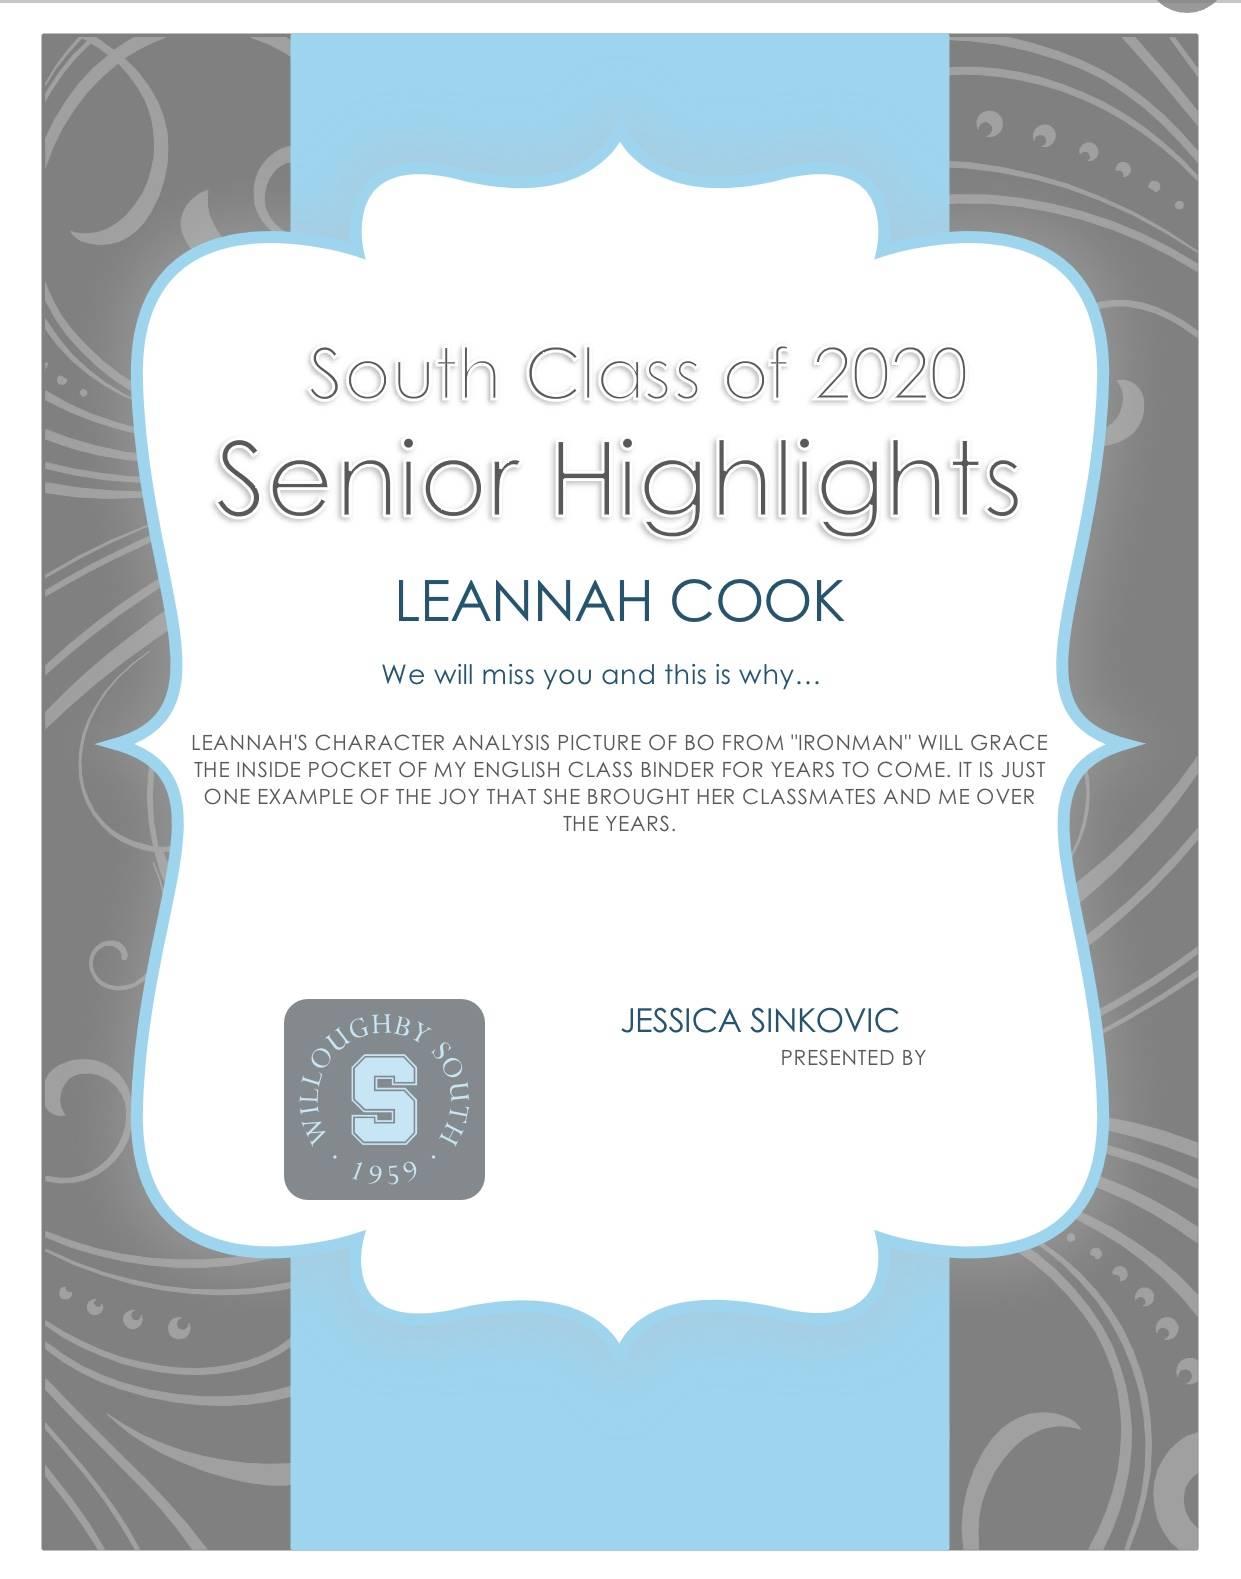 Leannah Cook